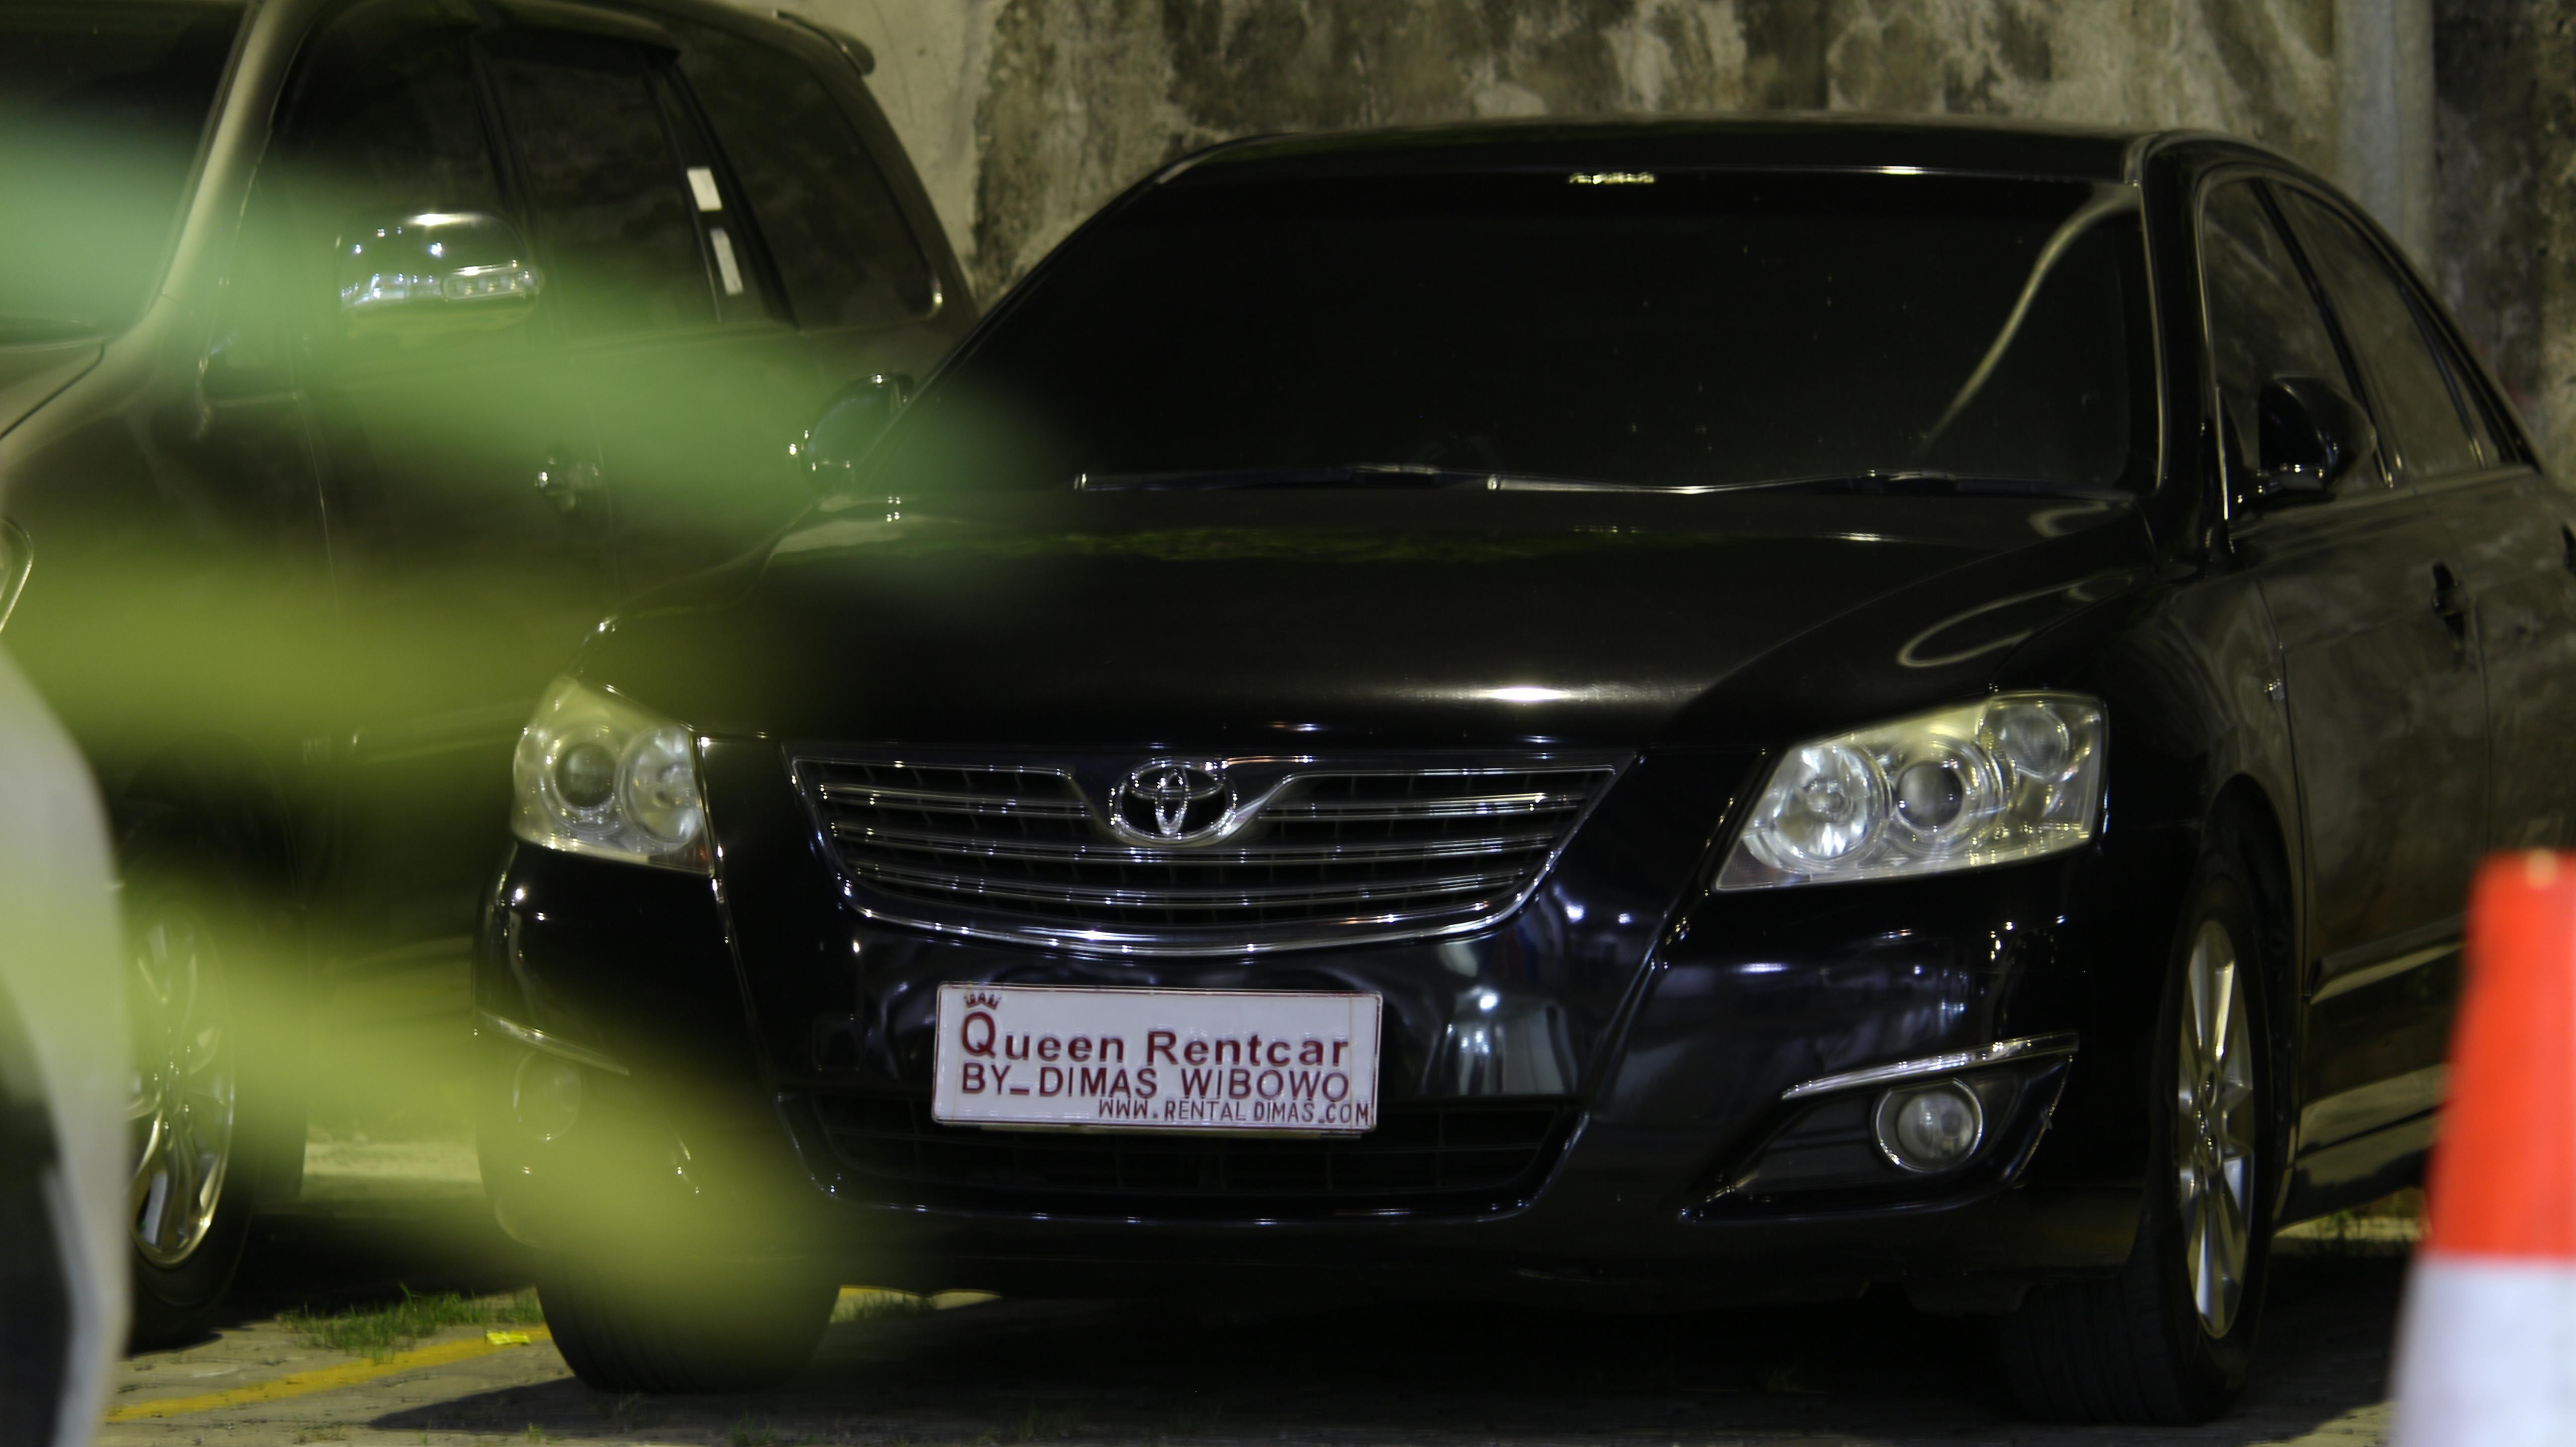 Rental Mobil Hyundai di Tanah Abang Jakarta Pusat murah